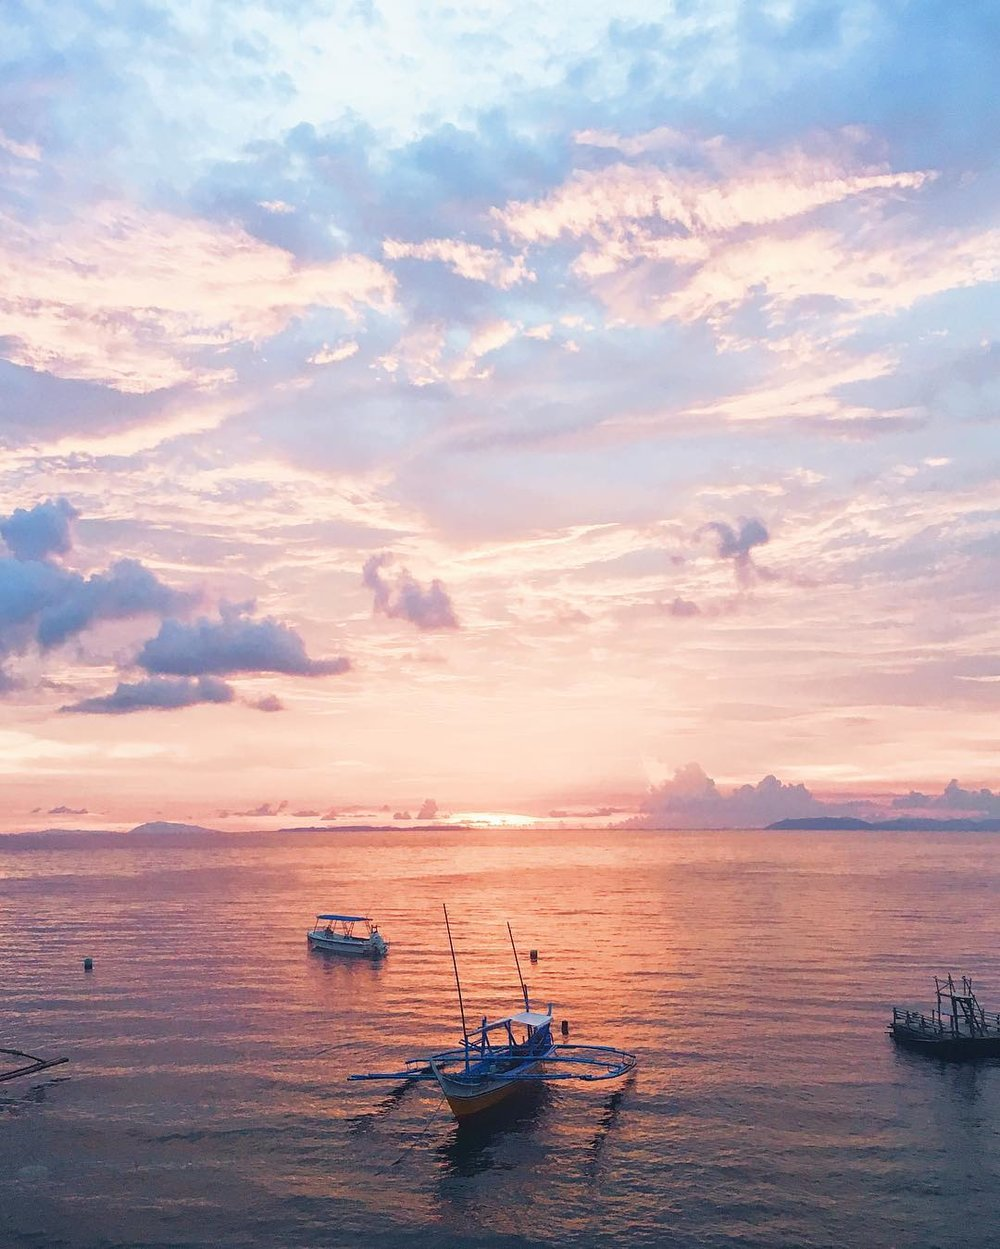 Anilao Beach in Mabini, Batangas Province - Luzon, Philippines